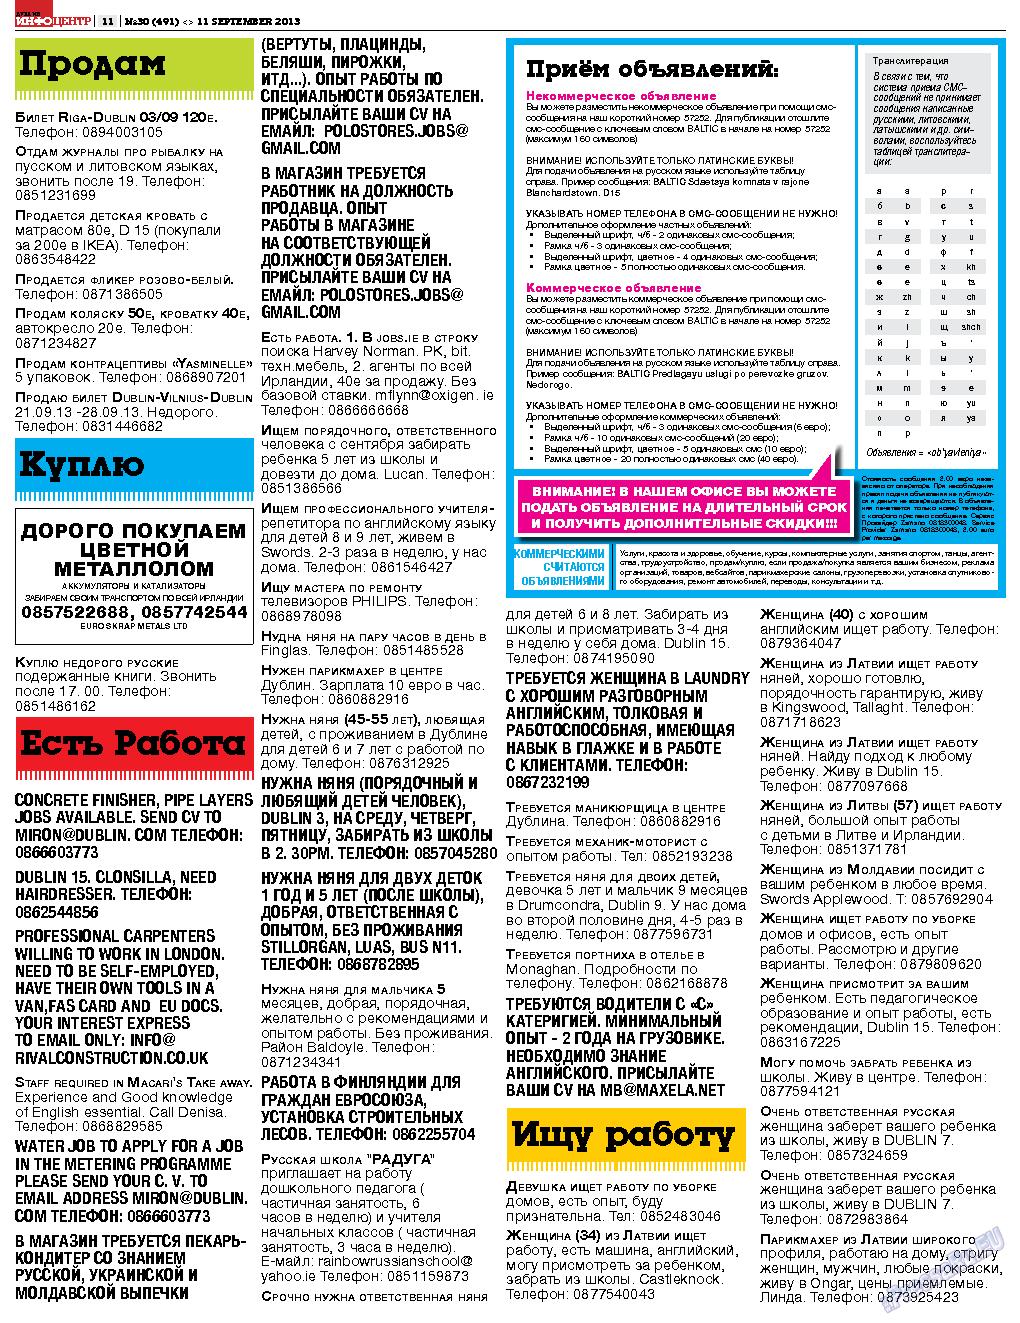 Дублин инфоцентр (газета). 2013 год, номер 30, стр. 11